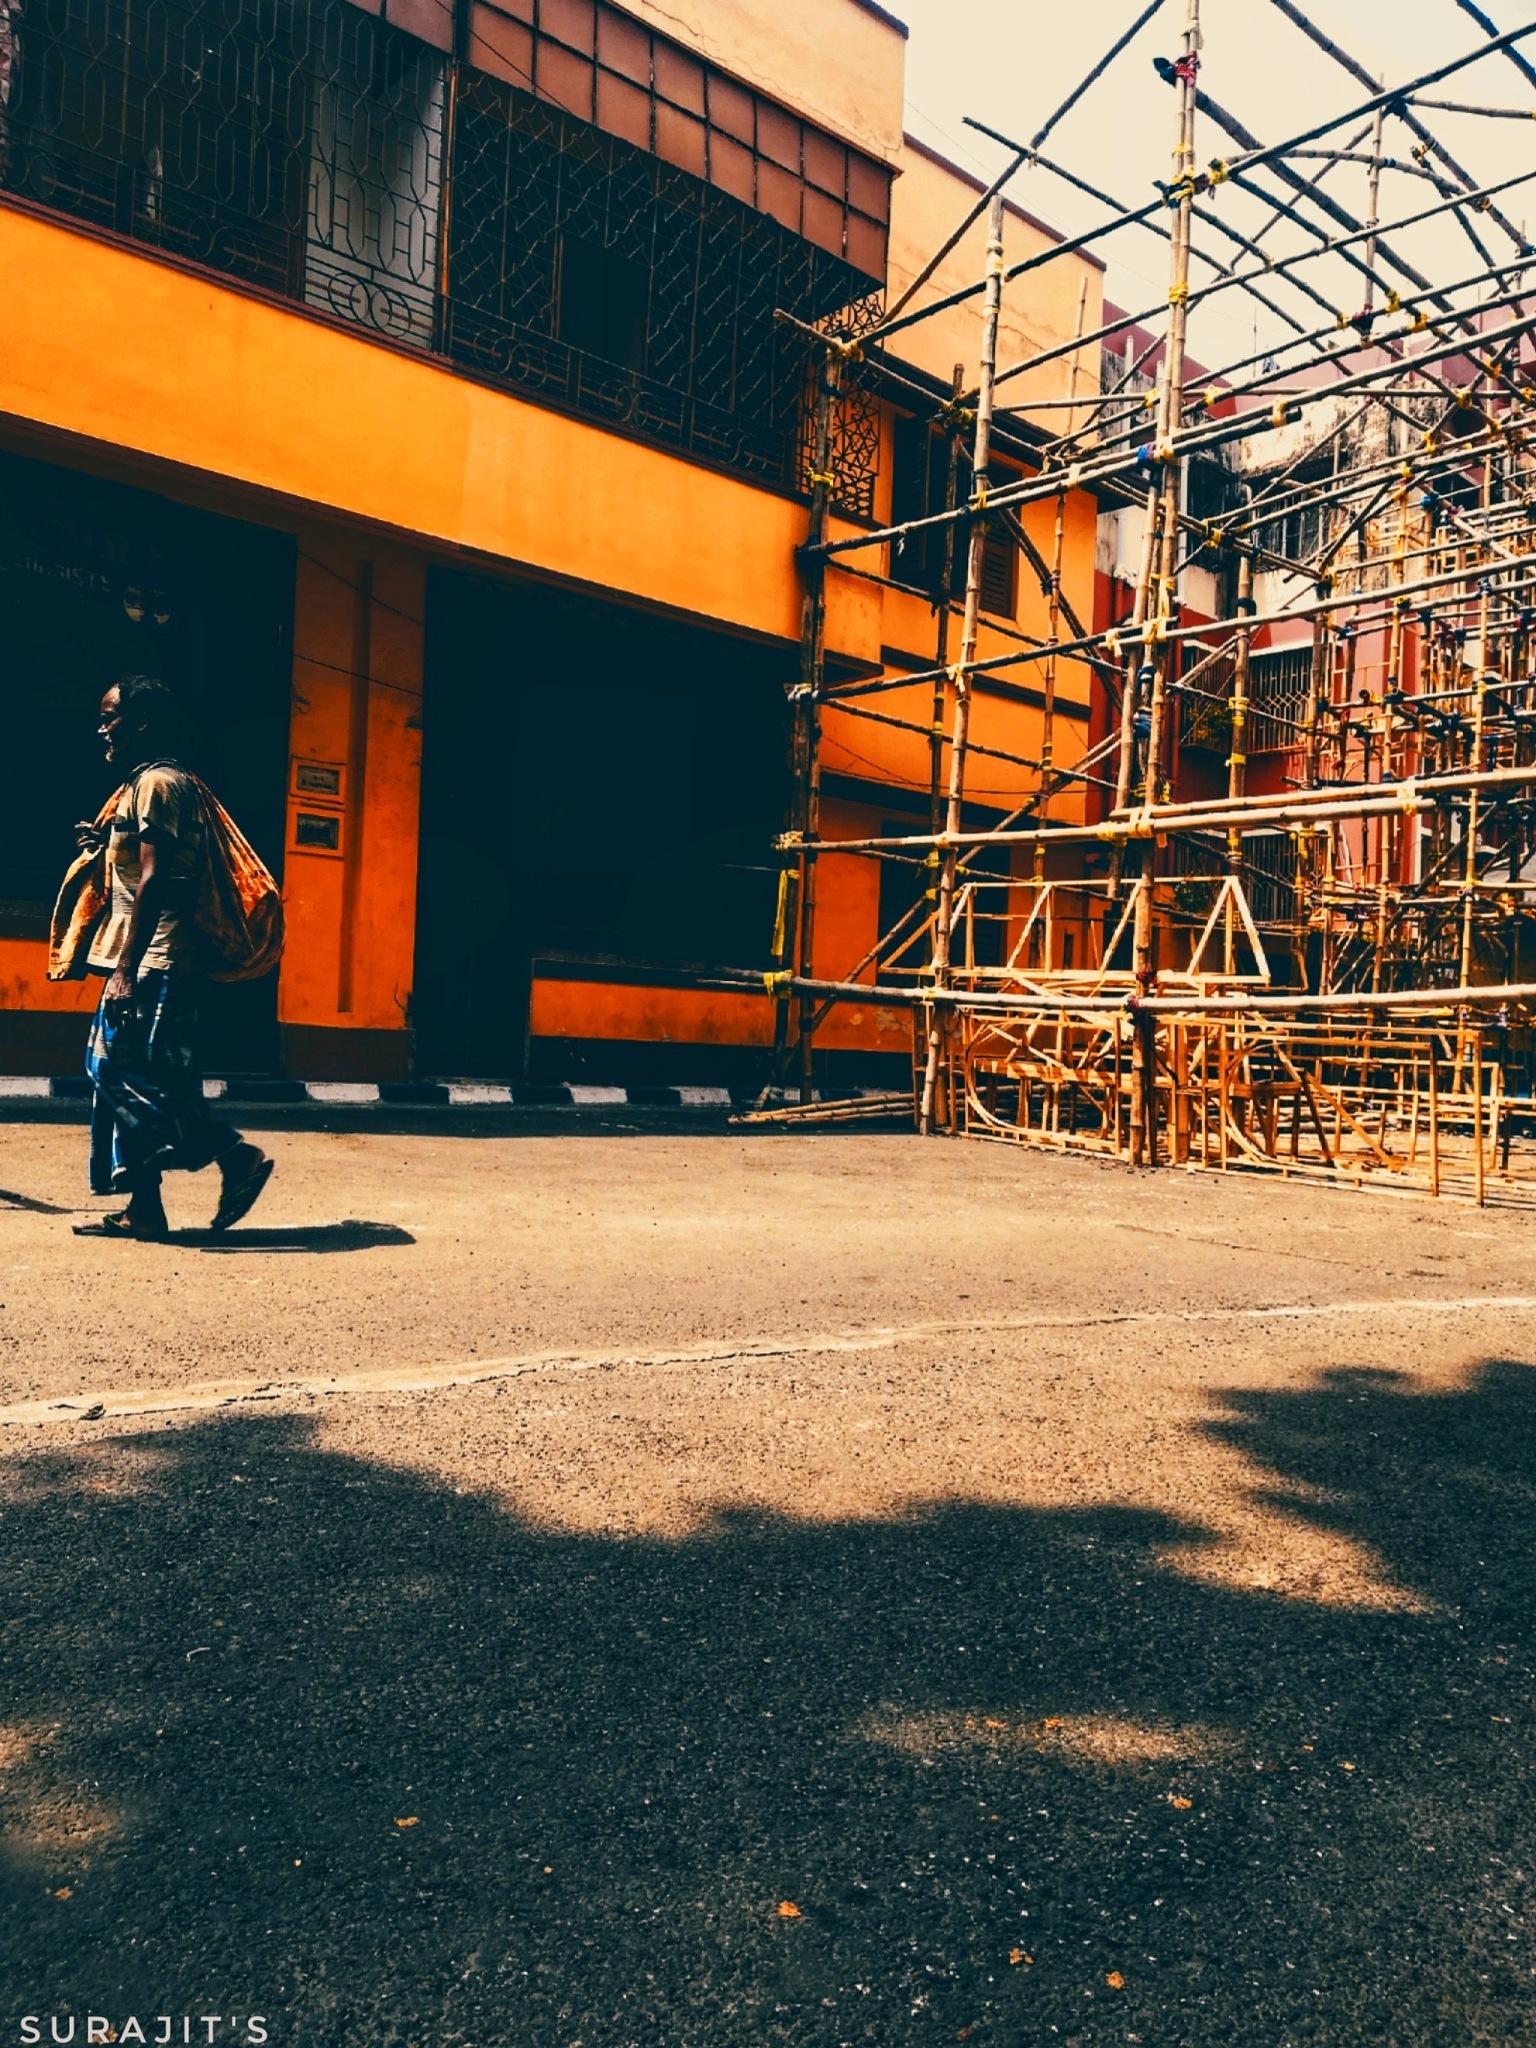 hoty noon. by Surajit Bhattacharjee